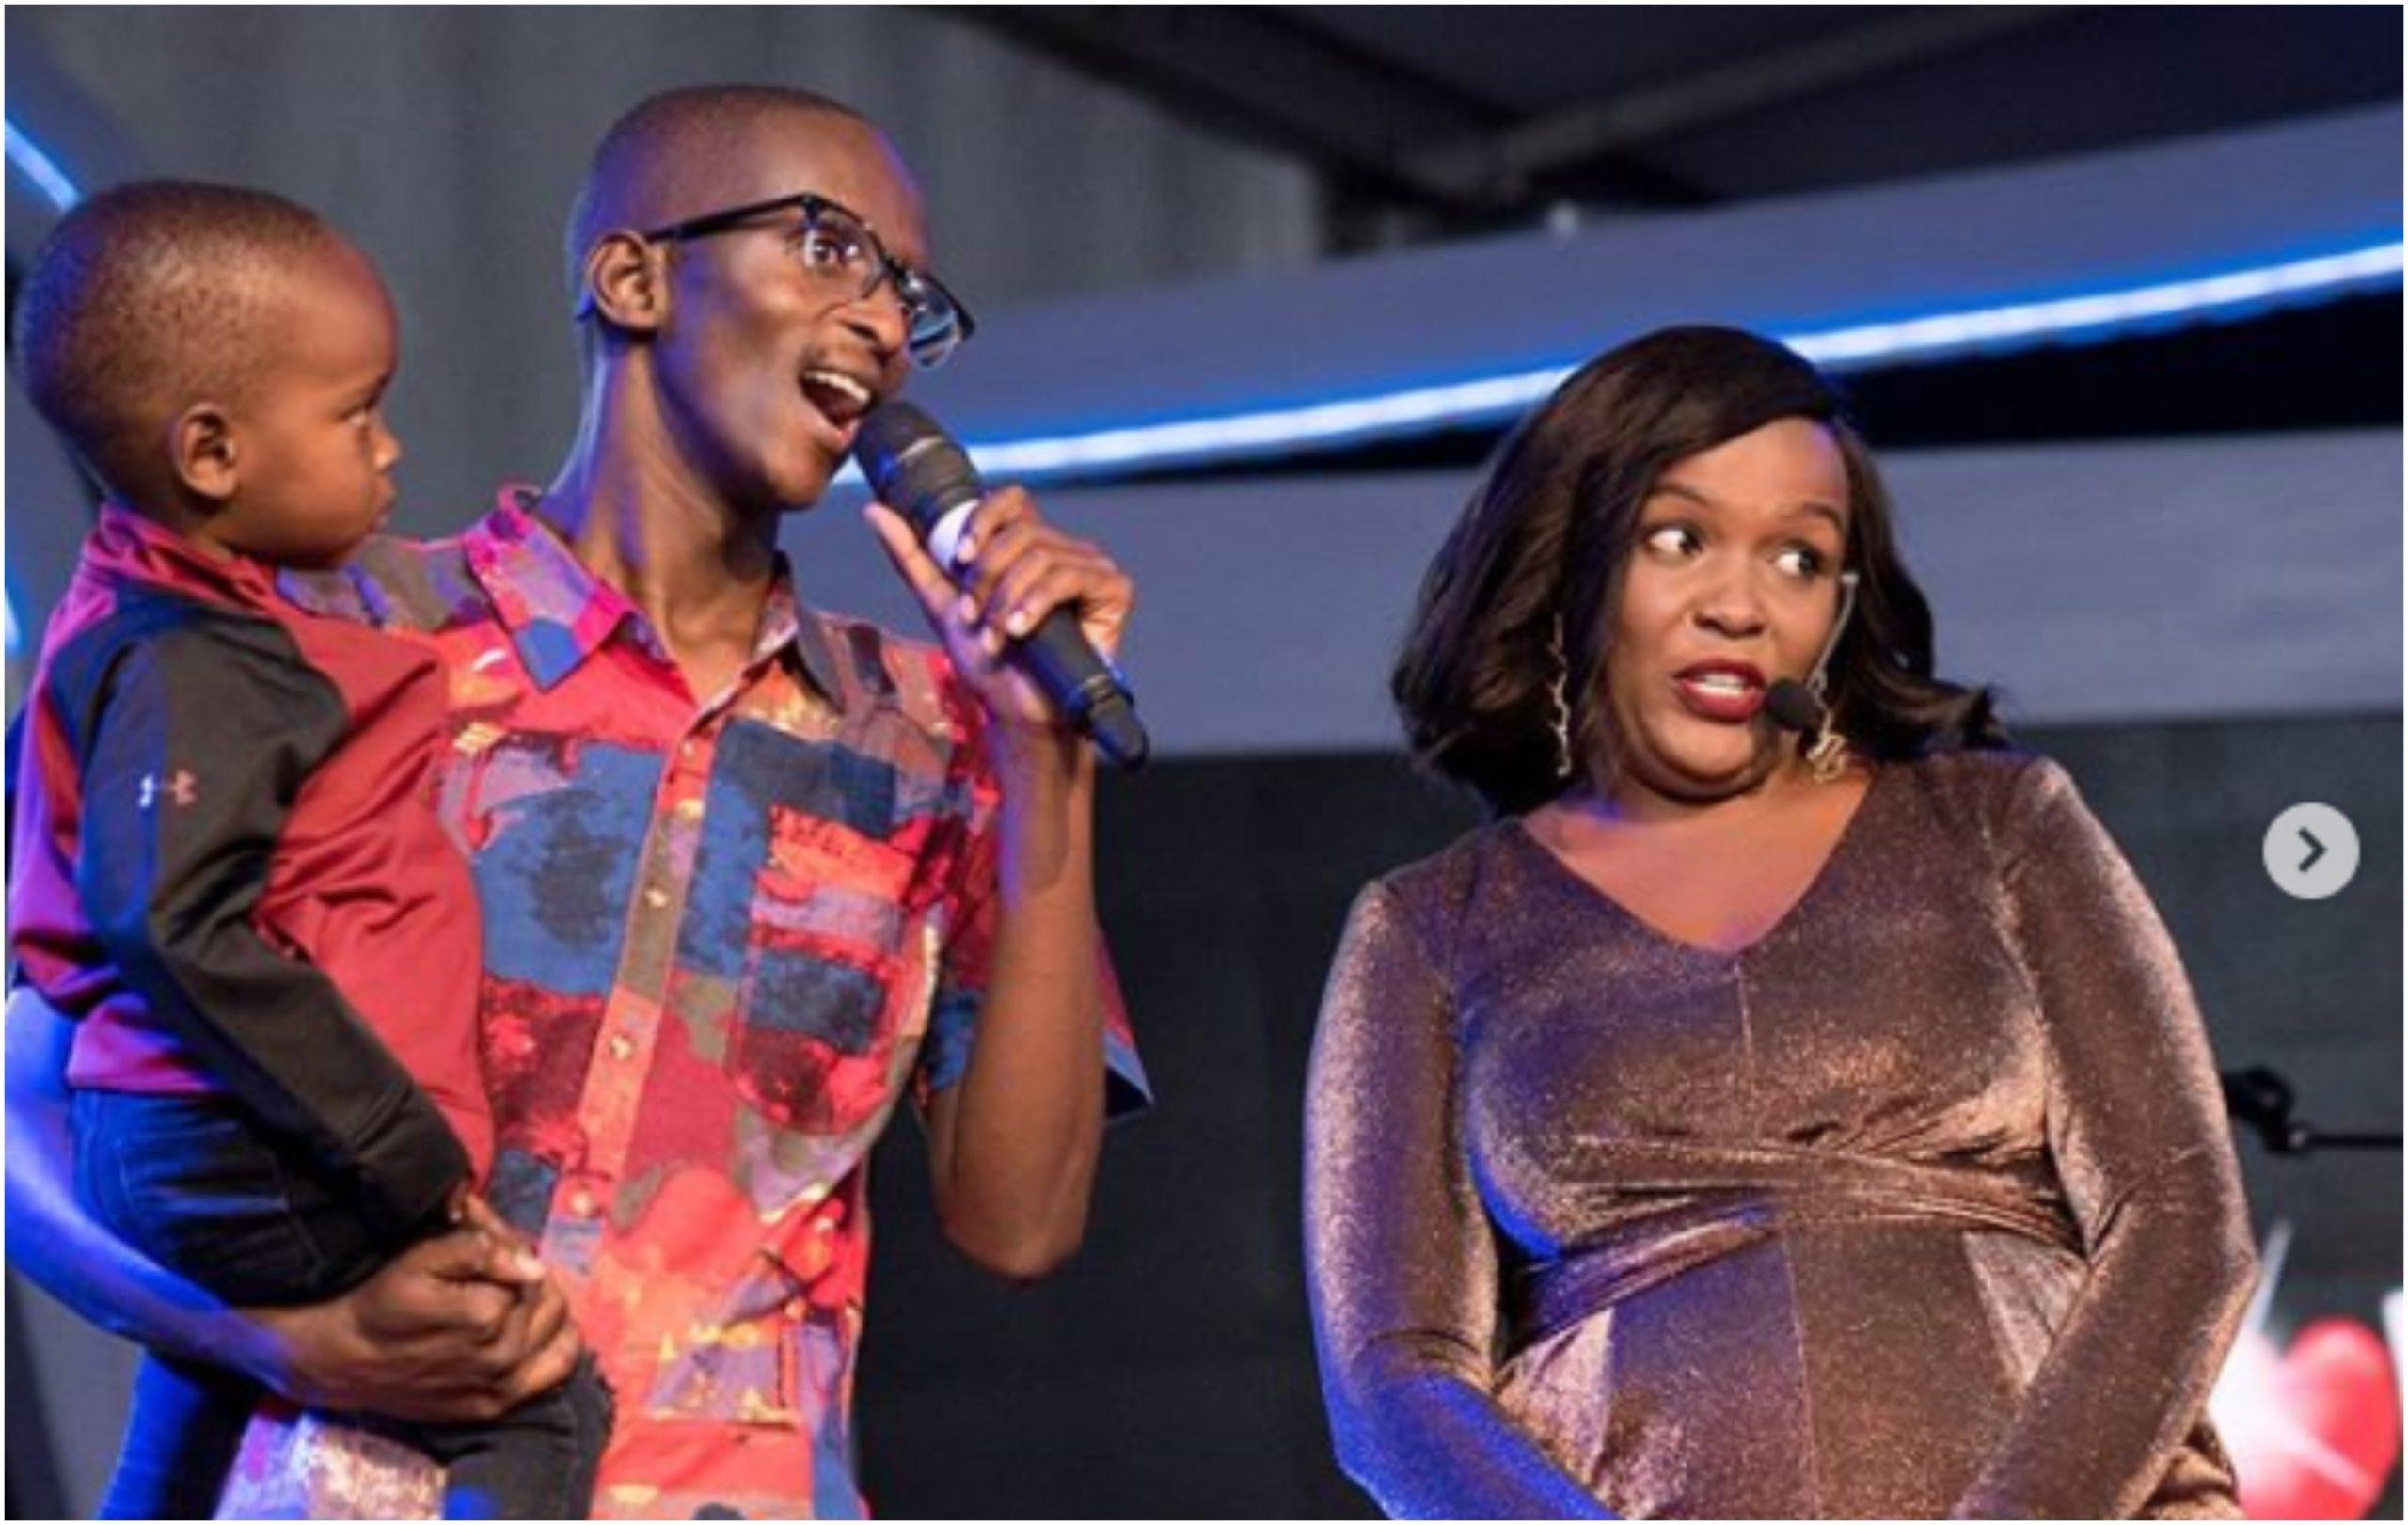 Celestine Ndinda's glammed-up look causing a stir online (Photo)